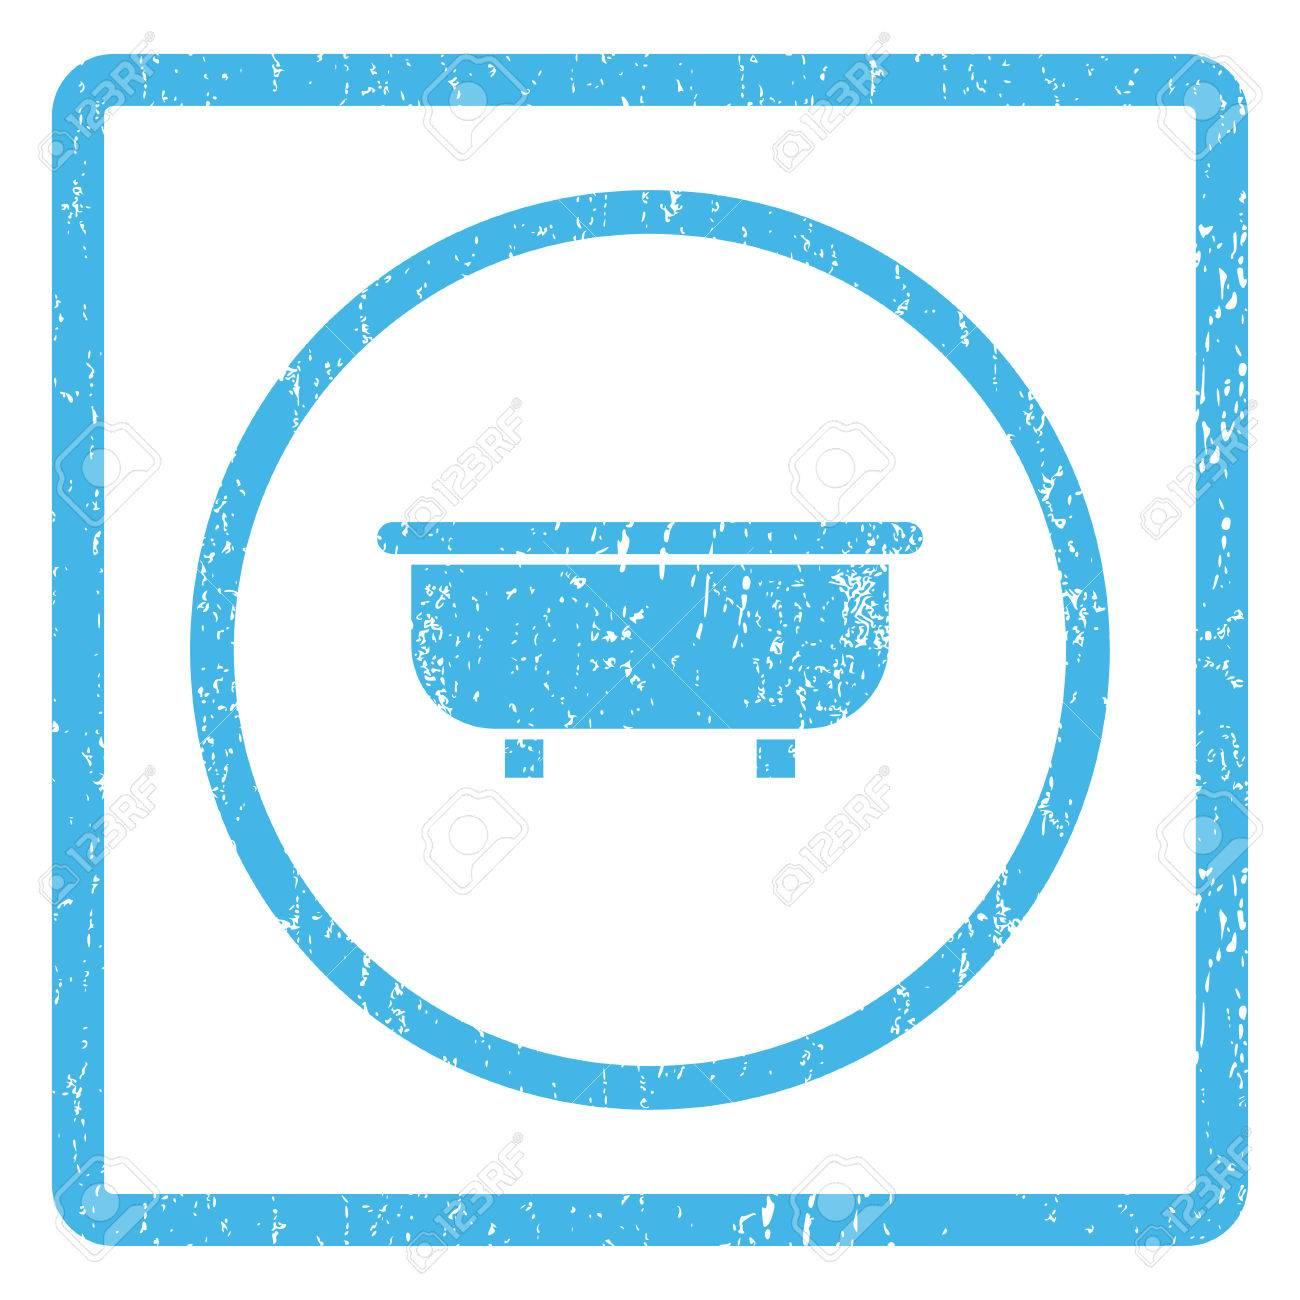 Fine Seal Bathtub Images - Bathroom and Shower Ideas - purosion.com